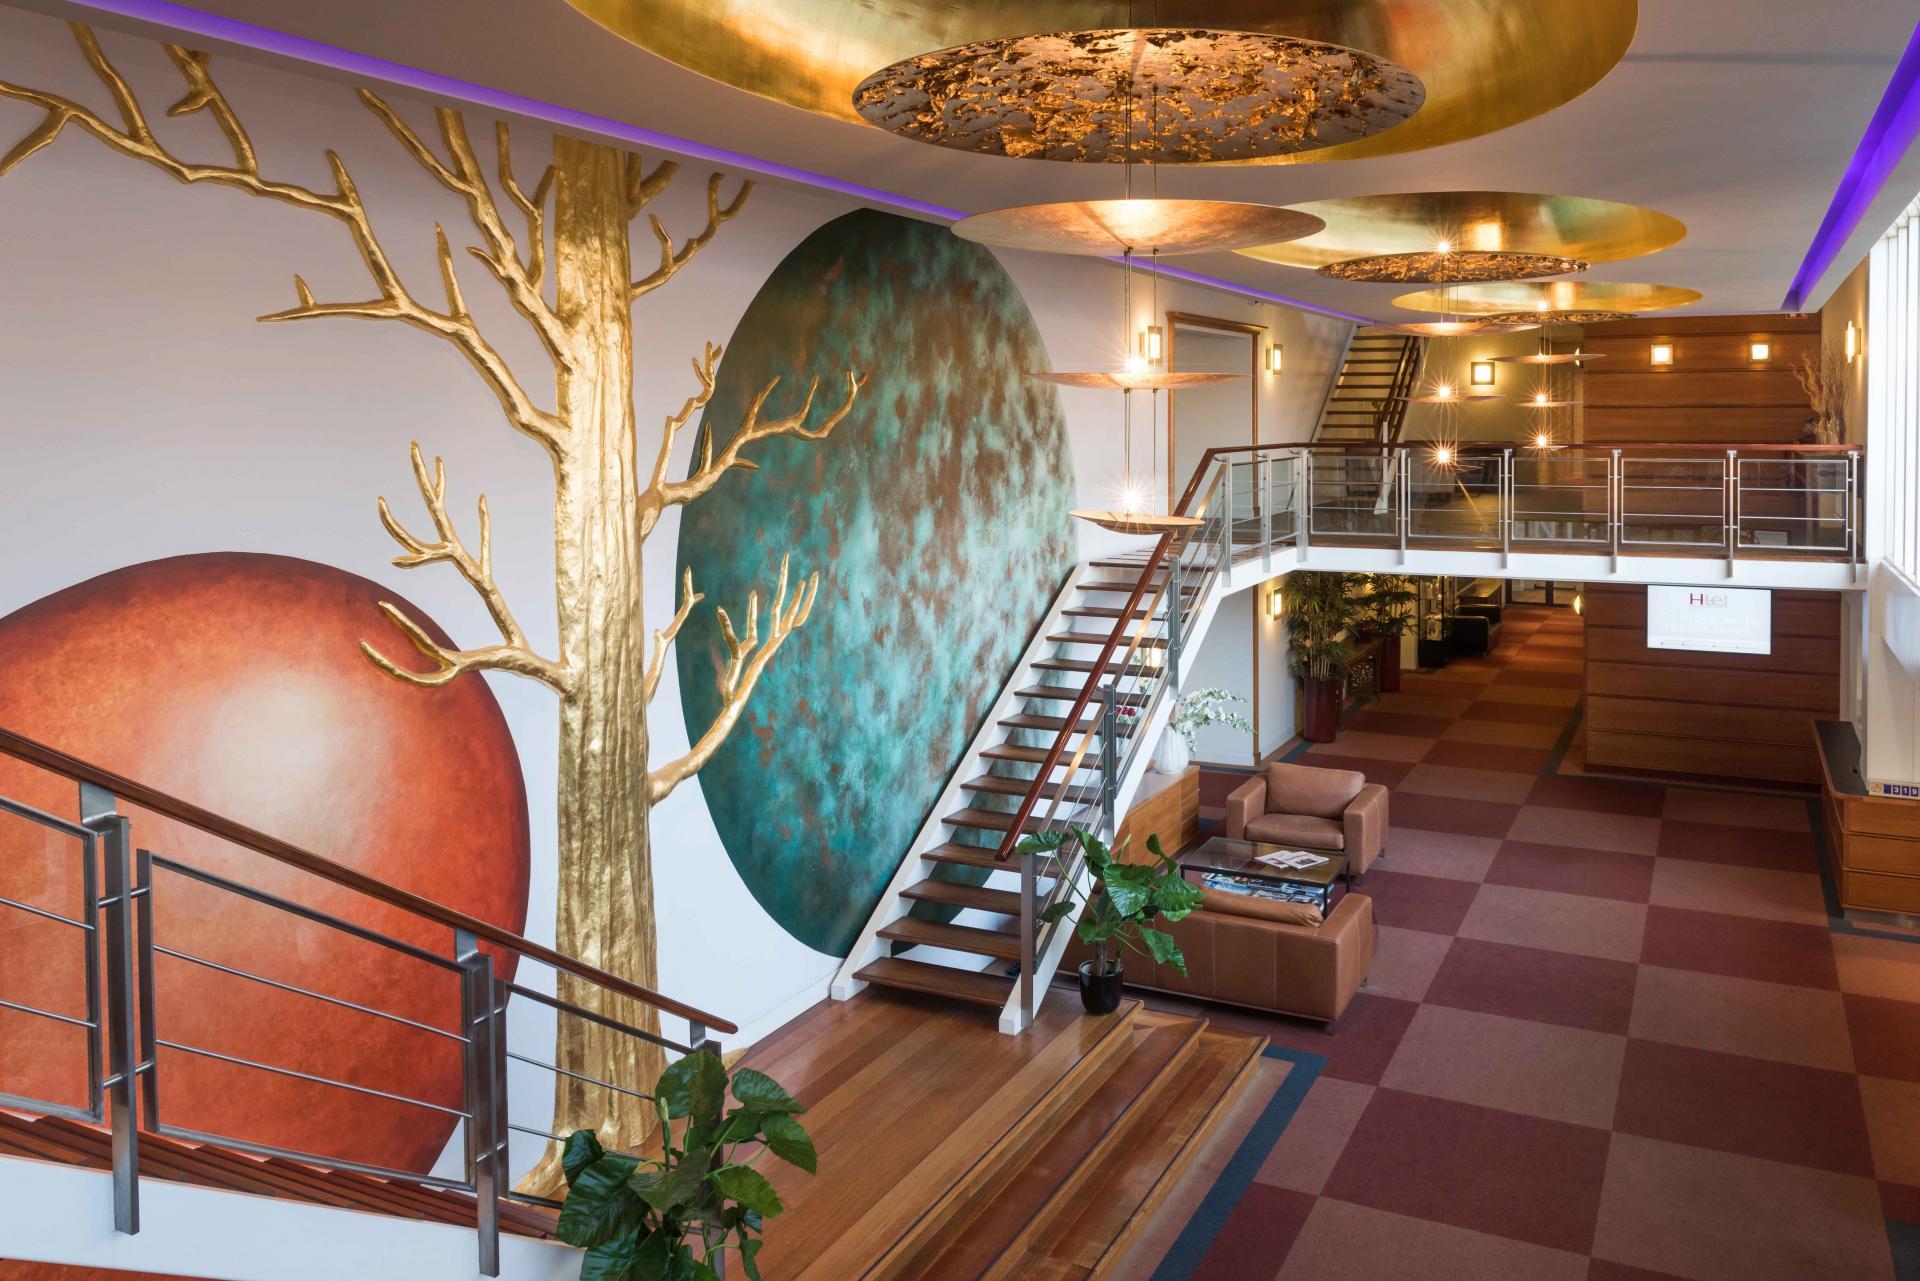 Lobby at Htel Amstelveen, Amsterdam